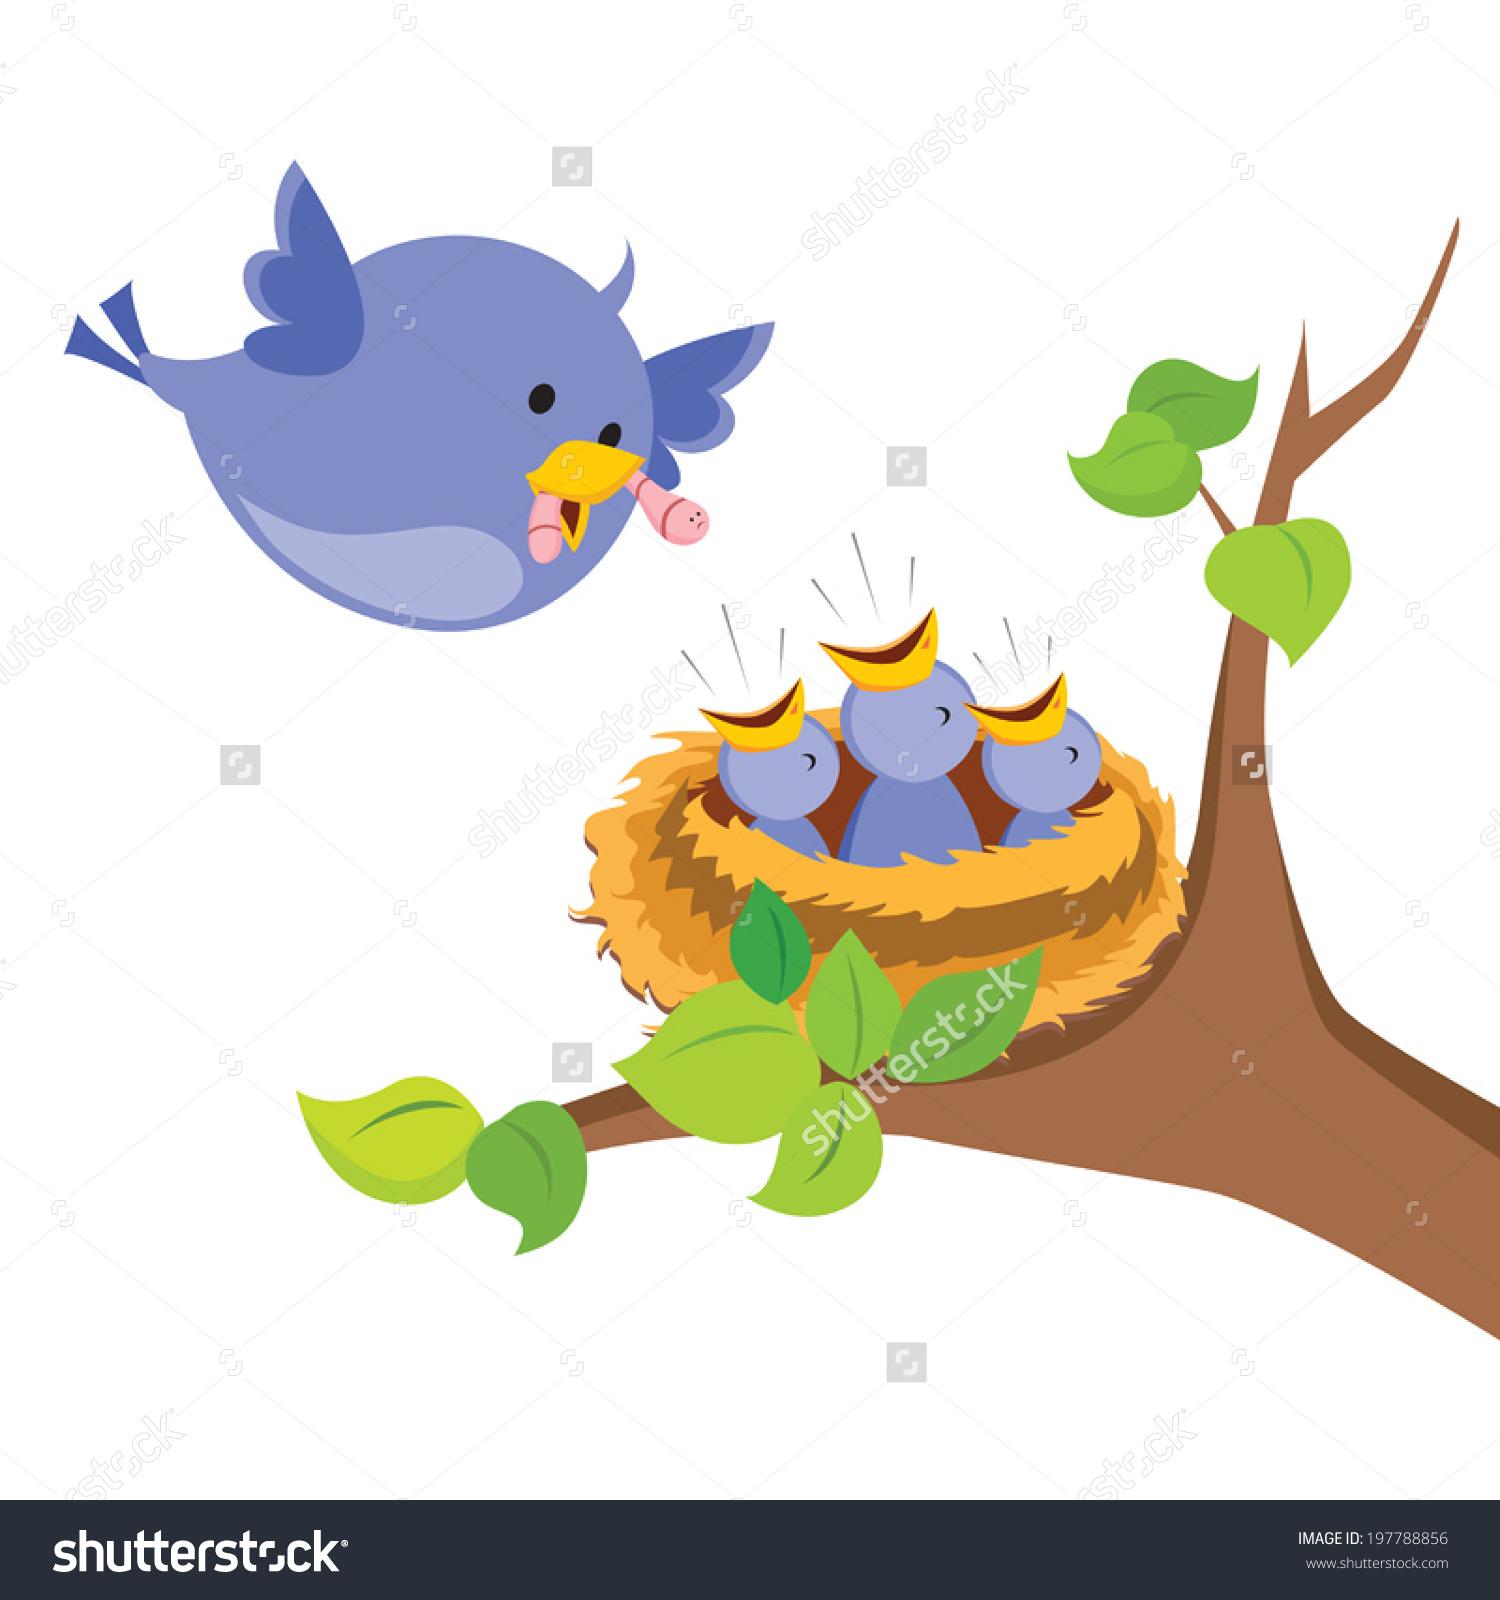 Mama bird clip art clip freeuse stock Mother Bird Love Mother Bird Feeds Stock Vector 197788856 ... clip freeuse stock